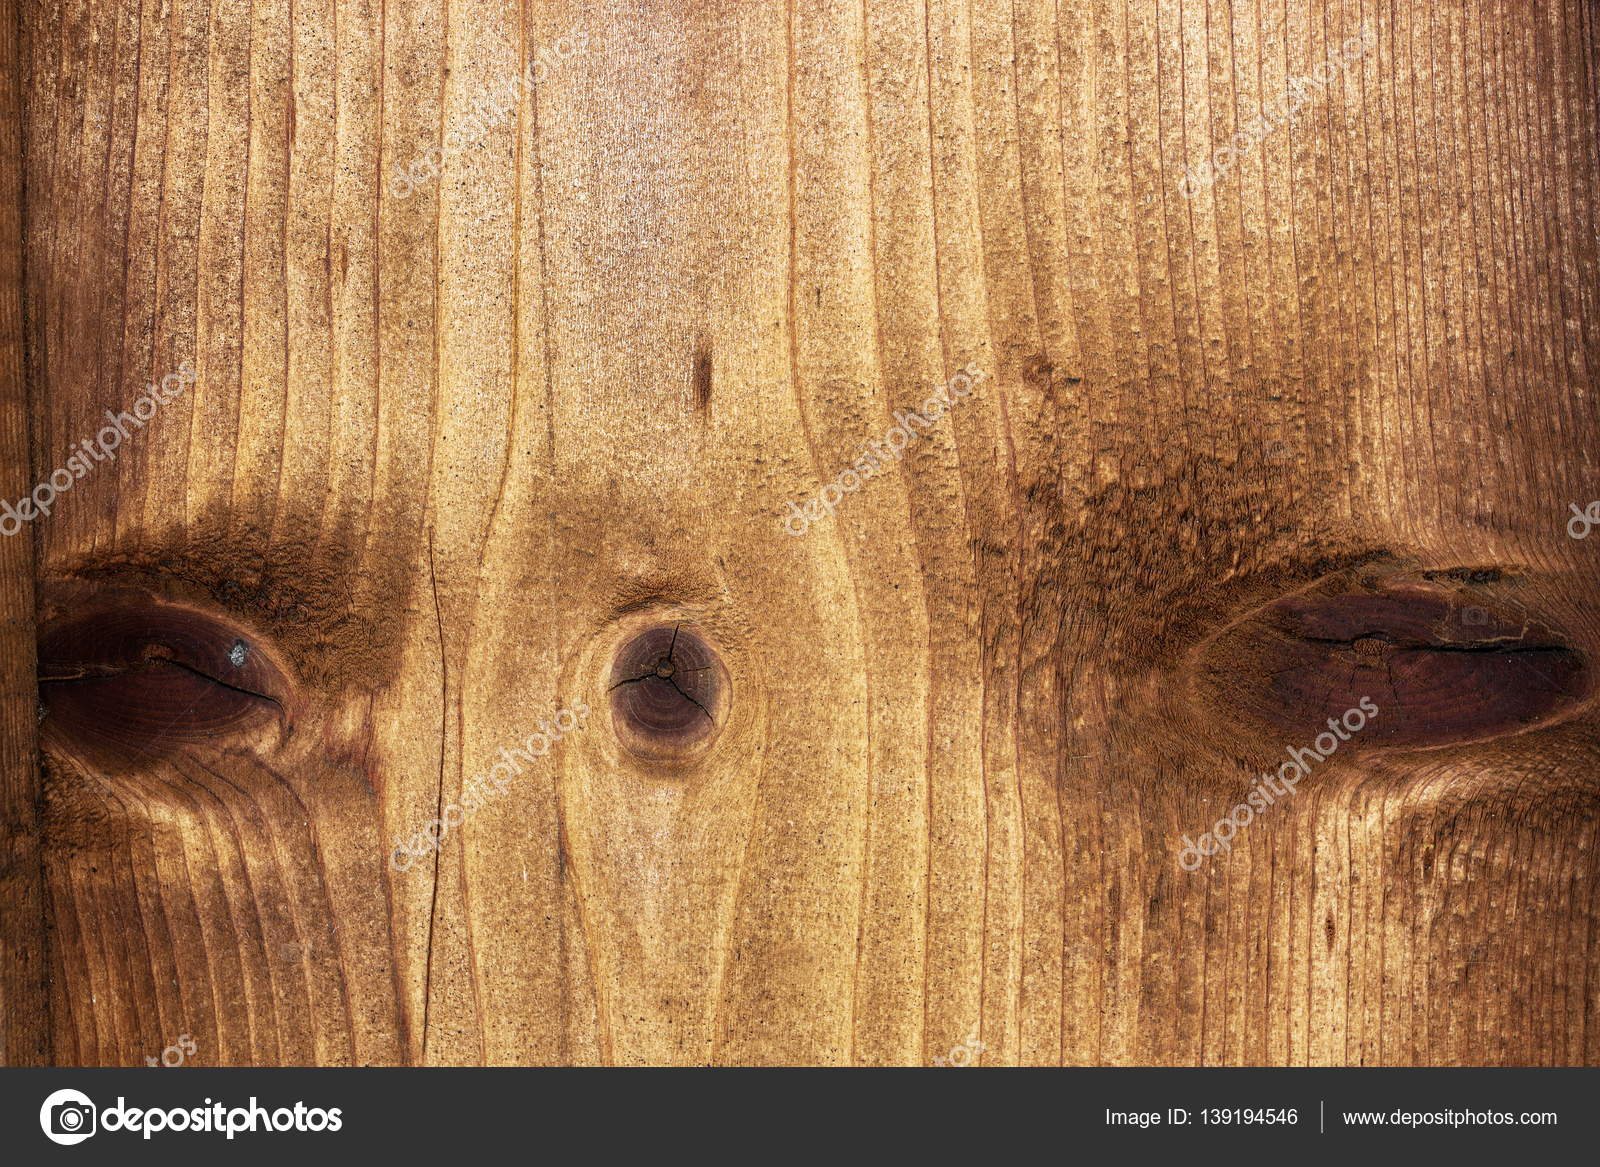 fir wood texture with knots stock photo taviphoto 139194546